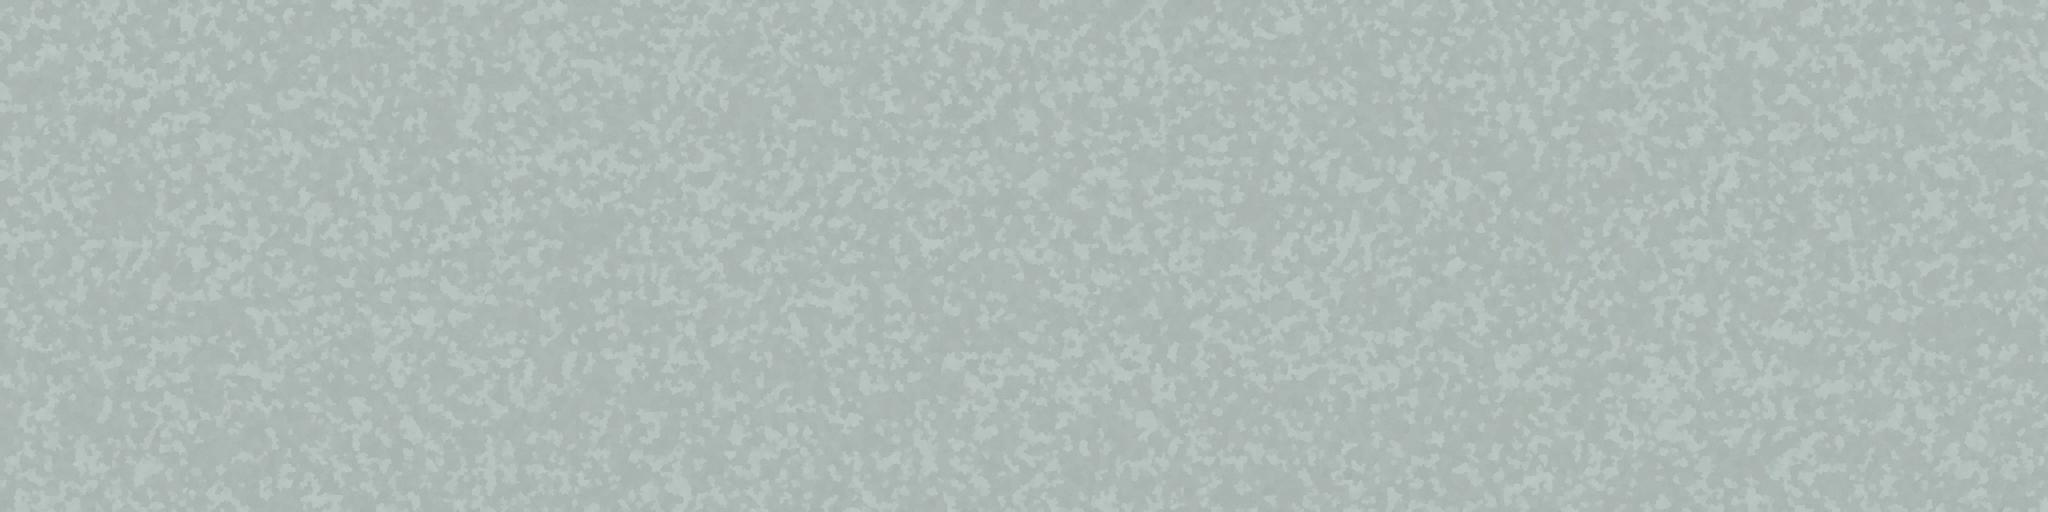 Light_Steel_Galvanized 4096 1024.jpg